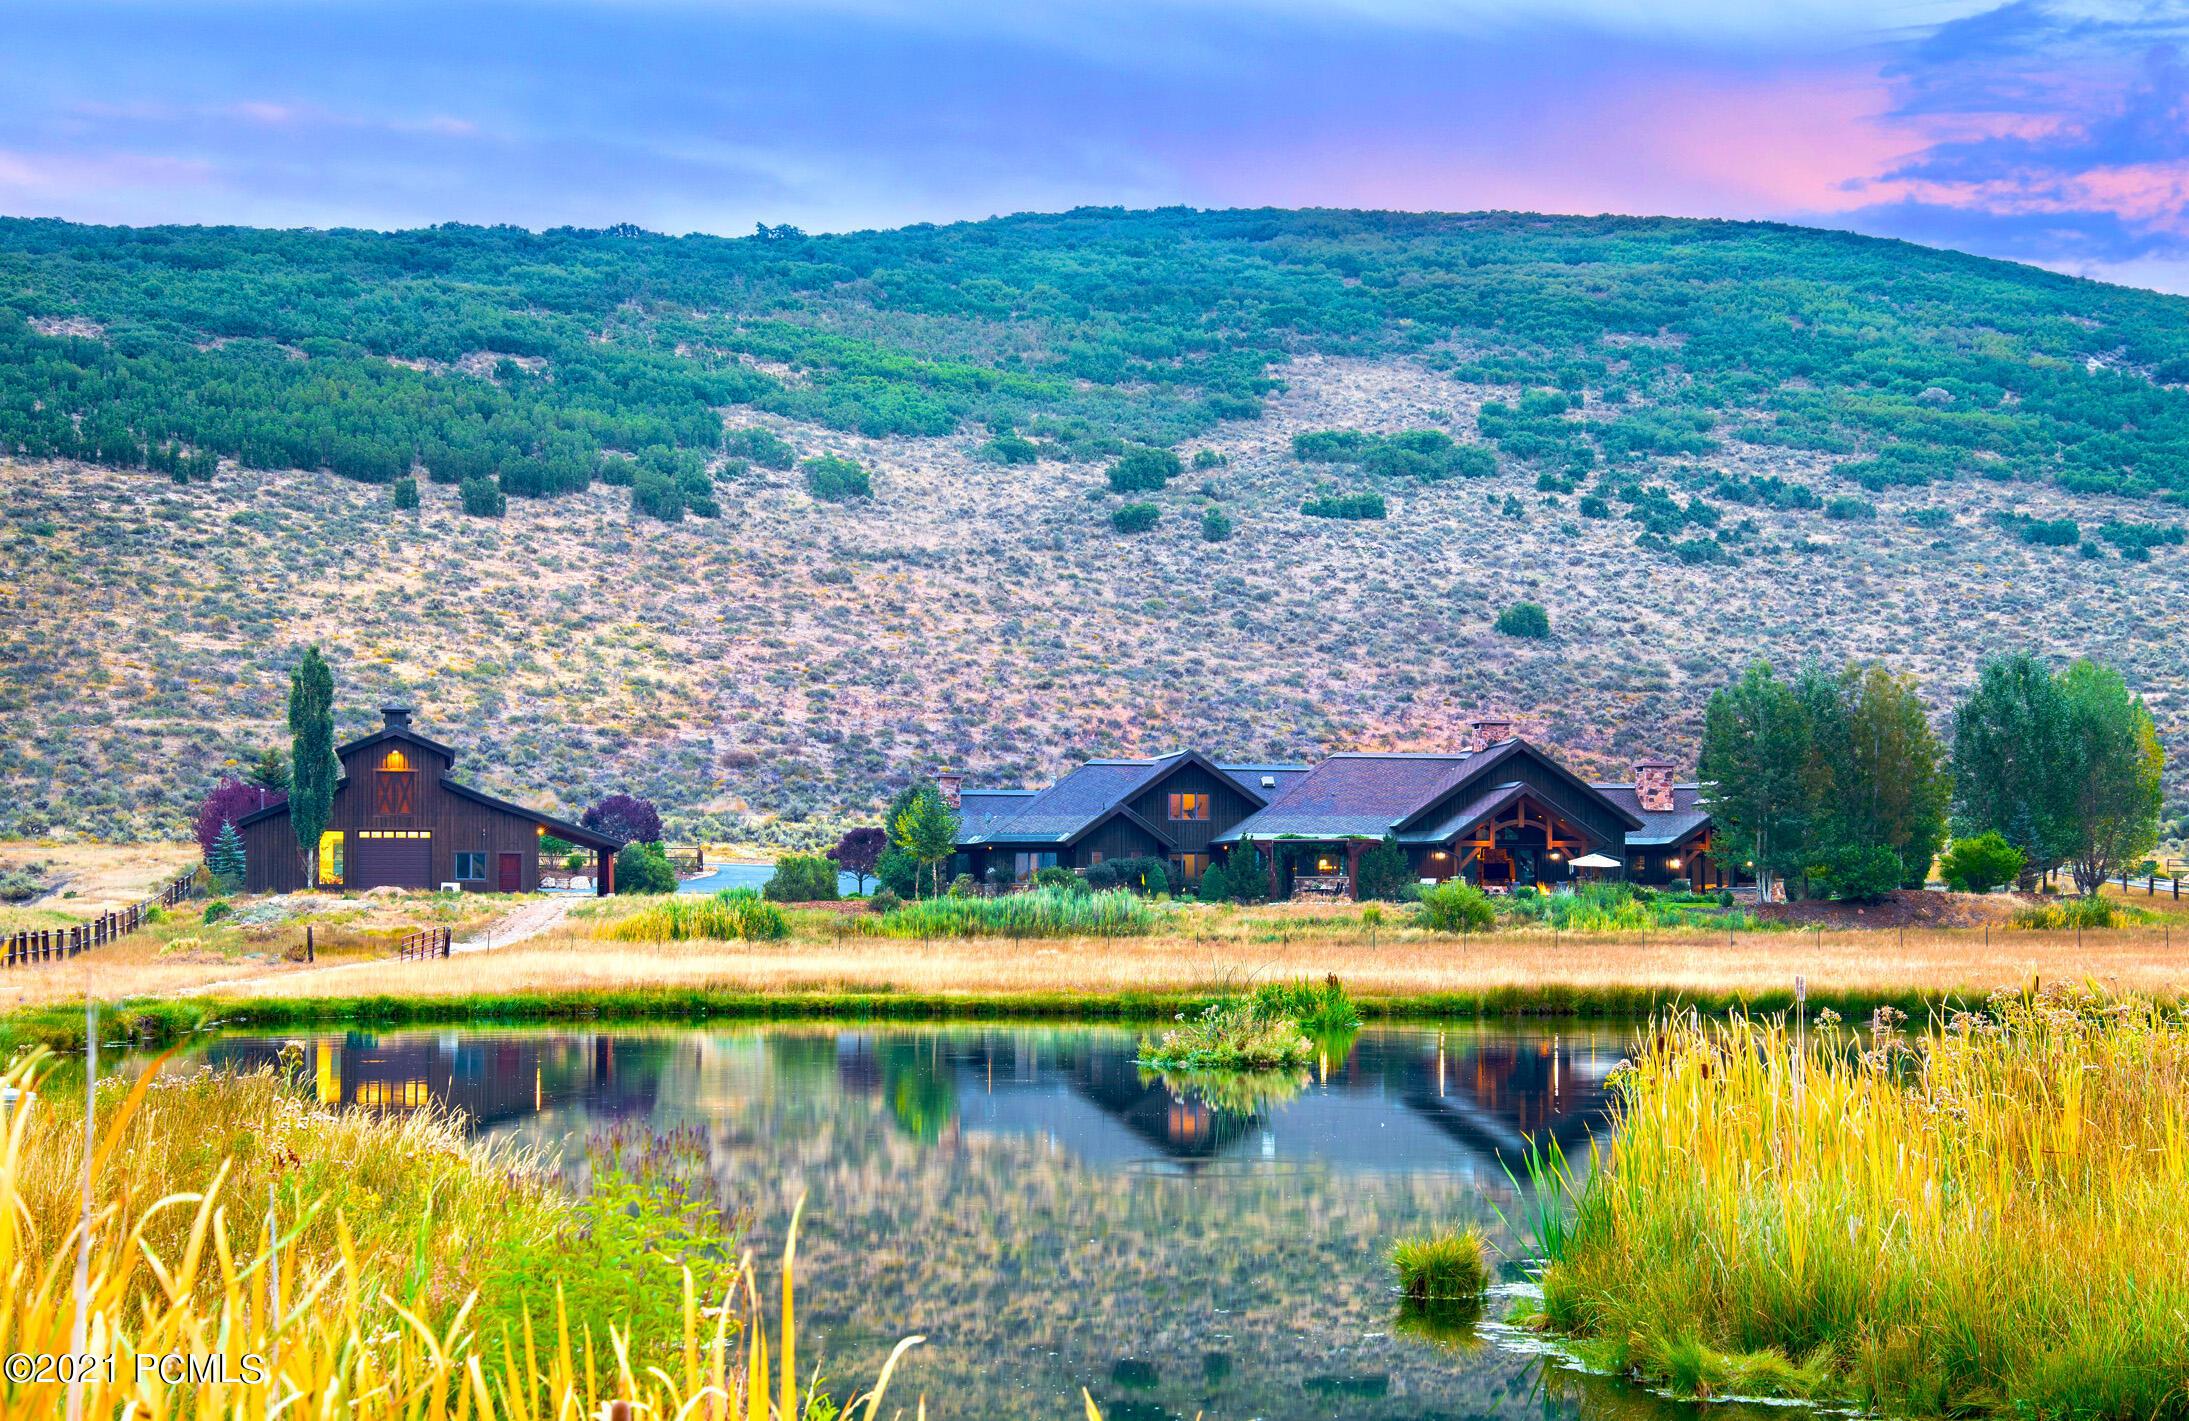 4117 250 E, Park City, Utah 84098, 5 Bedrooms Bedrooms, ,7 BathroomsBathrooms,Single Family,For Sale,250 E,12102460